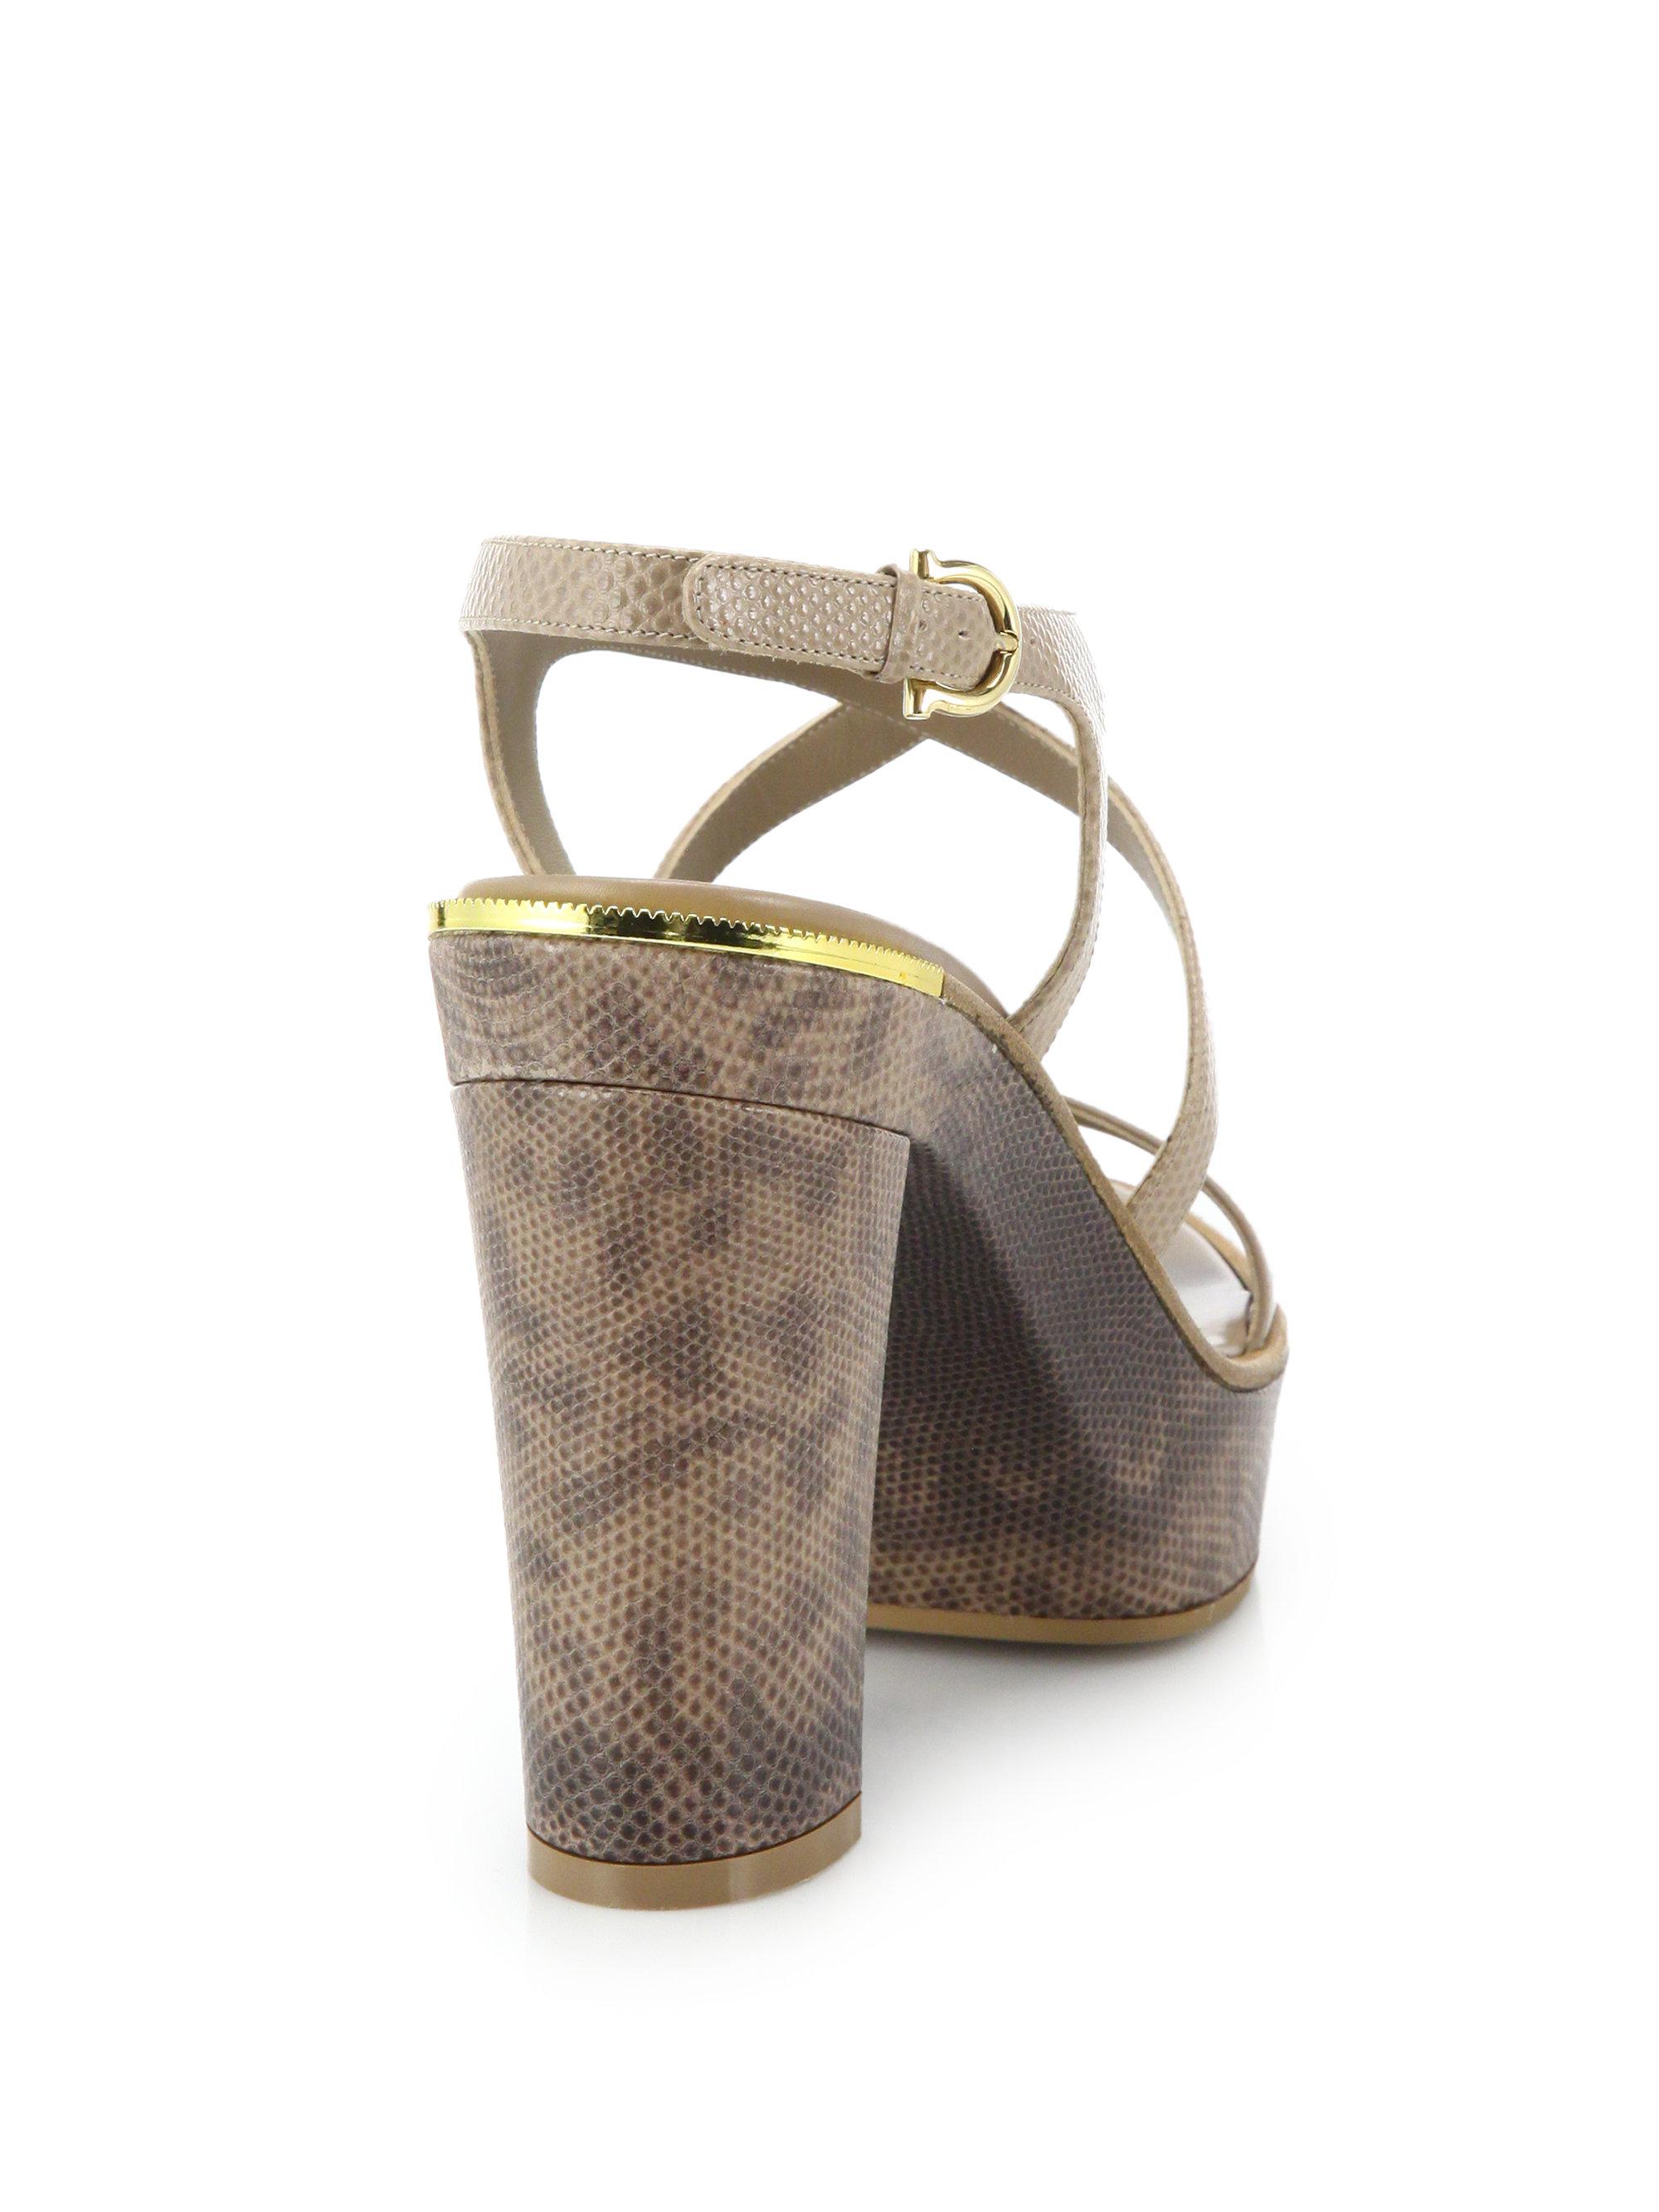 9547034bb5f ... 766e325dd128 Lyst - Ferragamo Gina Python-embossed Leather Platform  Sandals in .. ...